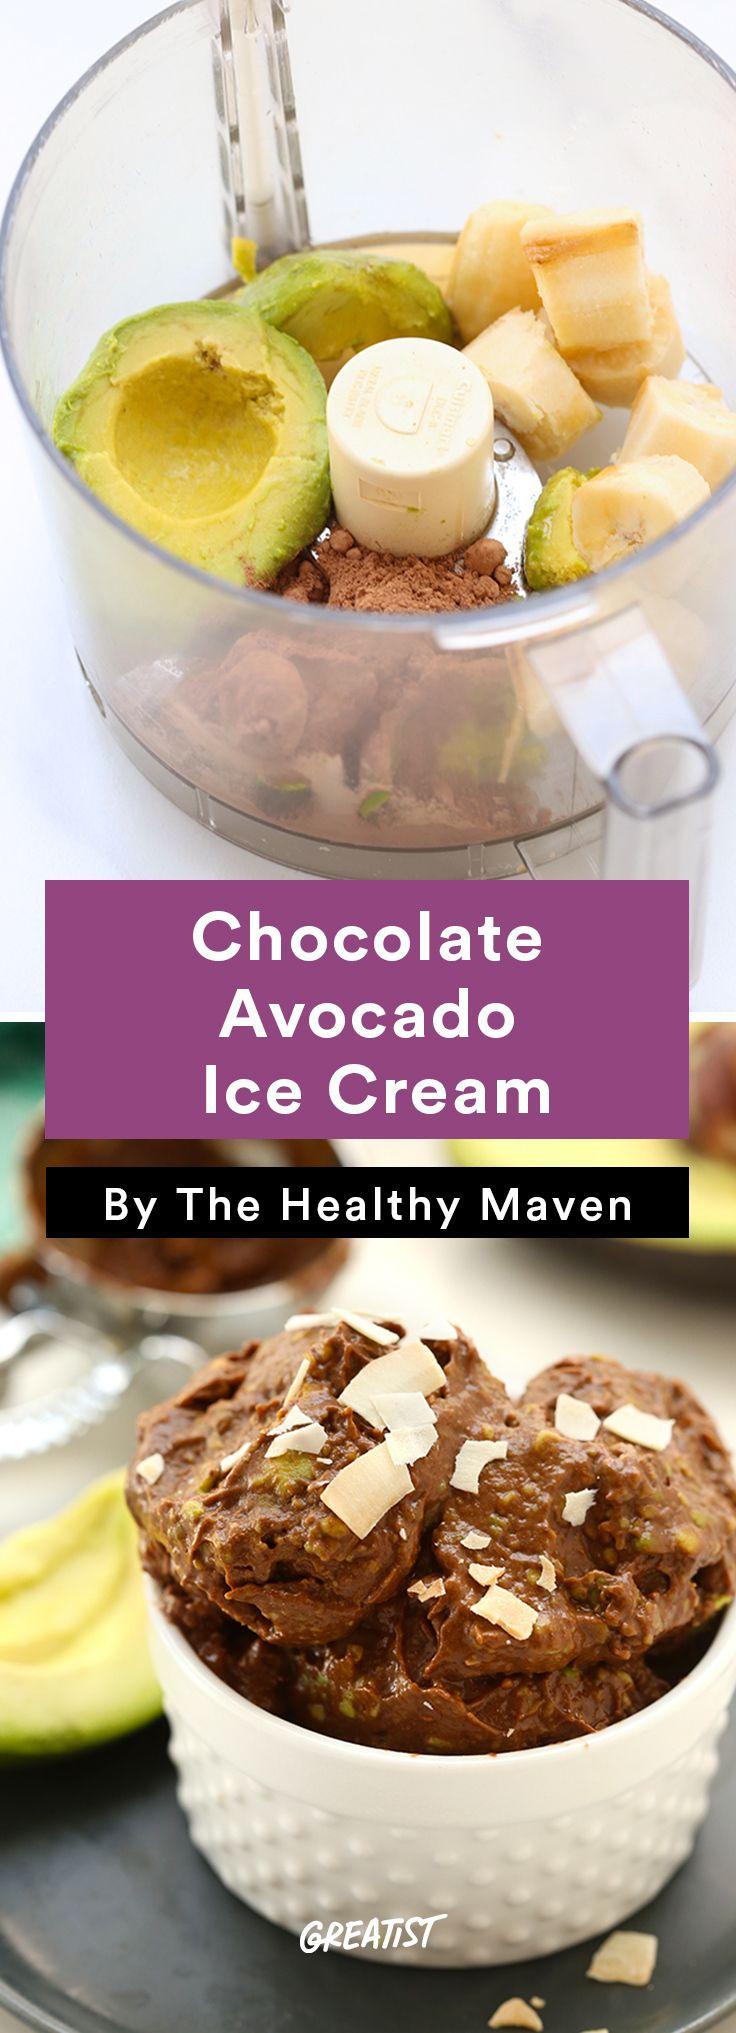 5. Chocolate Avocado Ice Cream #icecream #recipes http://greatist.com/eat/ice-cream-recipes-that-dont-require-fancy-equipment